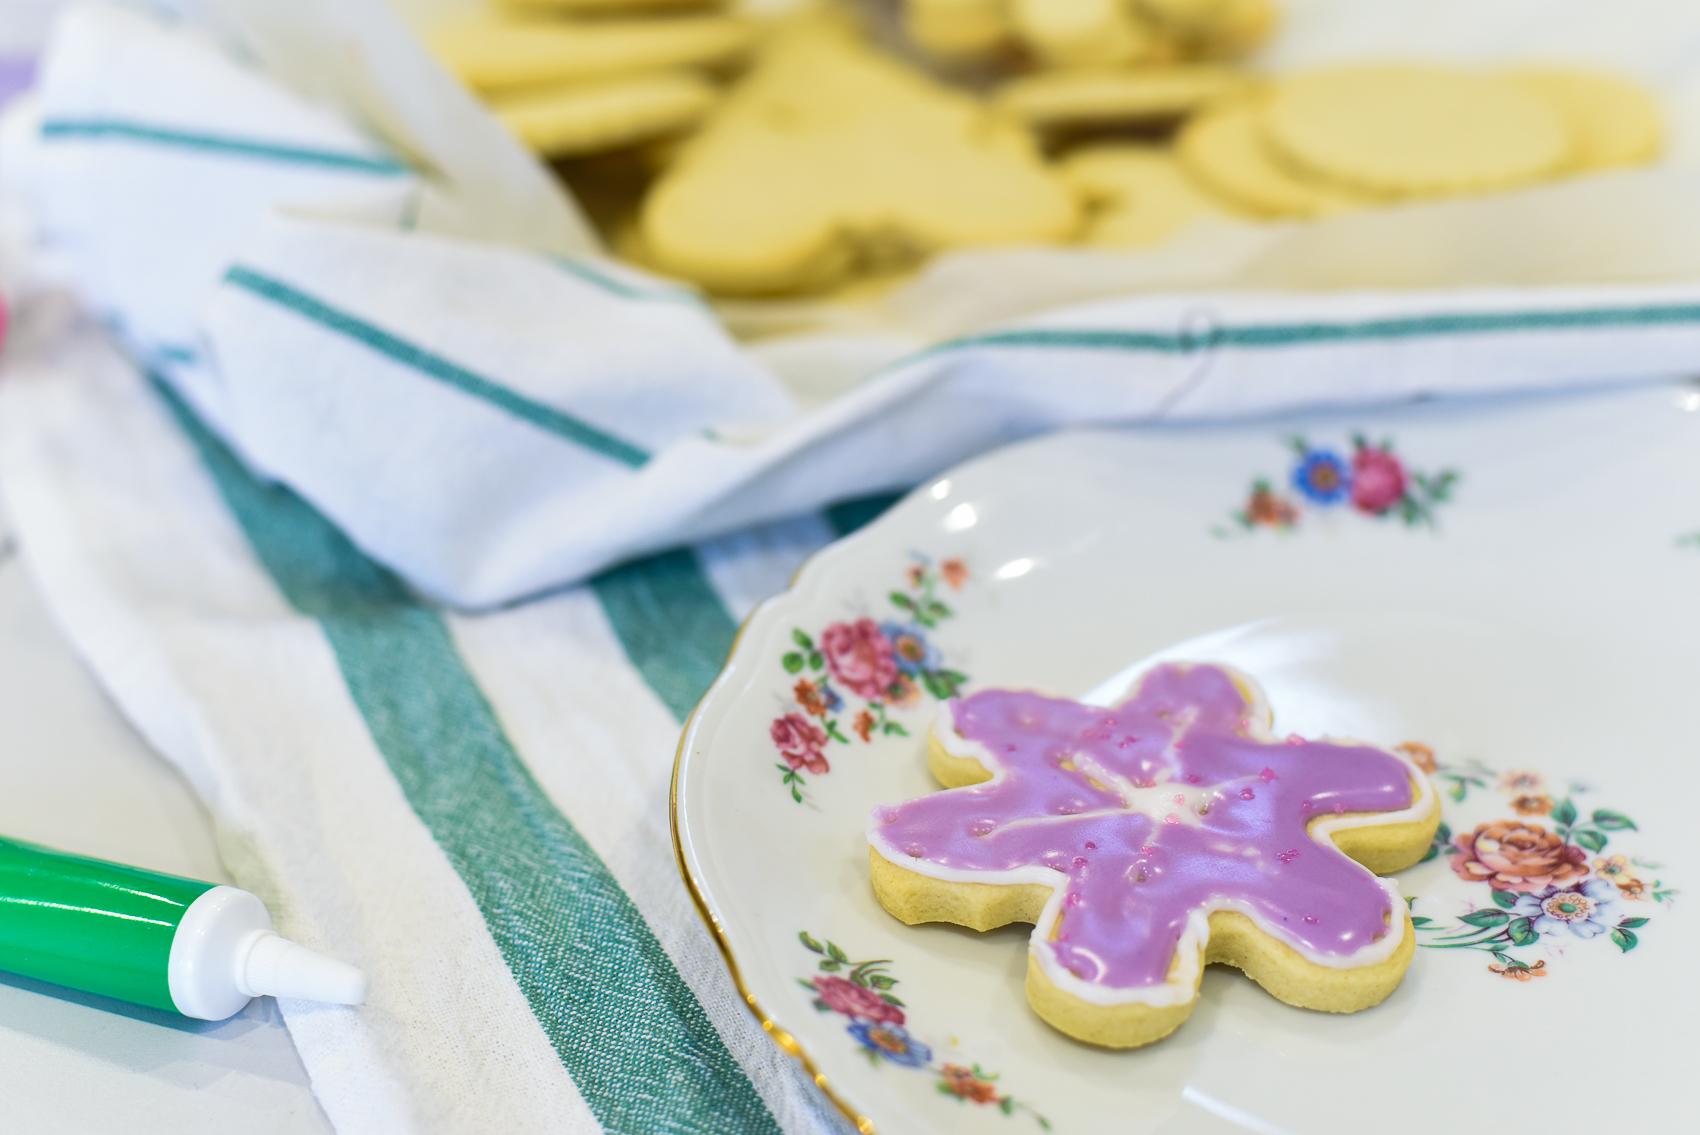 Biscuits Decorating Workshop